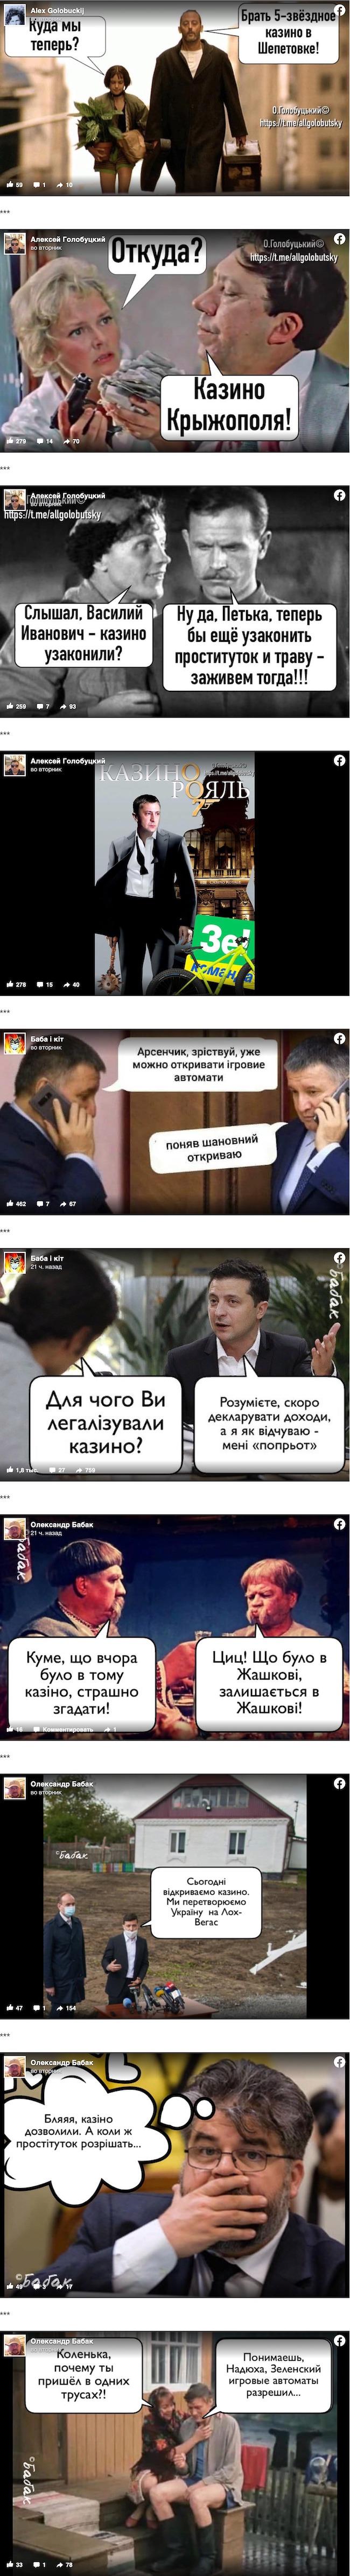 https://u-news.com.ua/uploads/posts/2020-07/1594875048_2.jpg